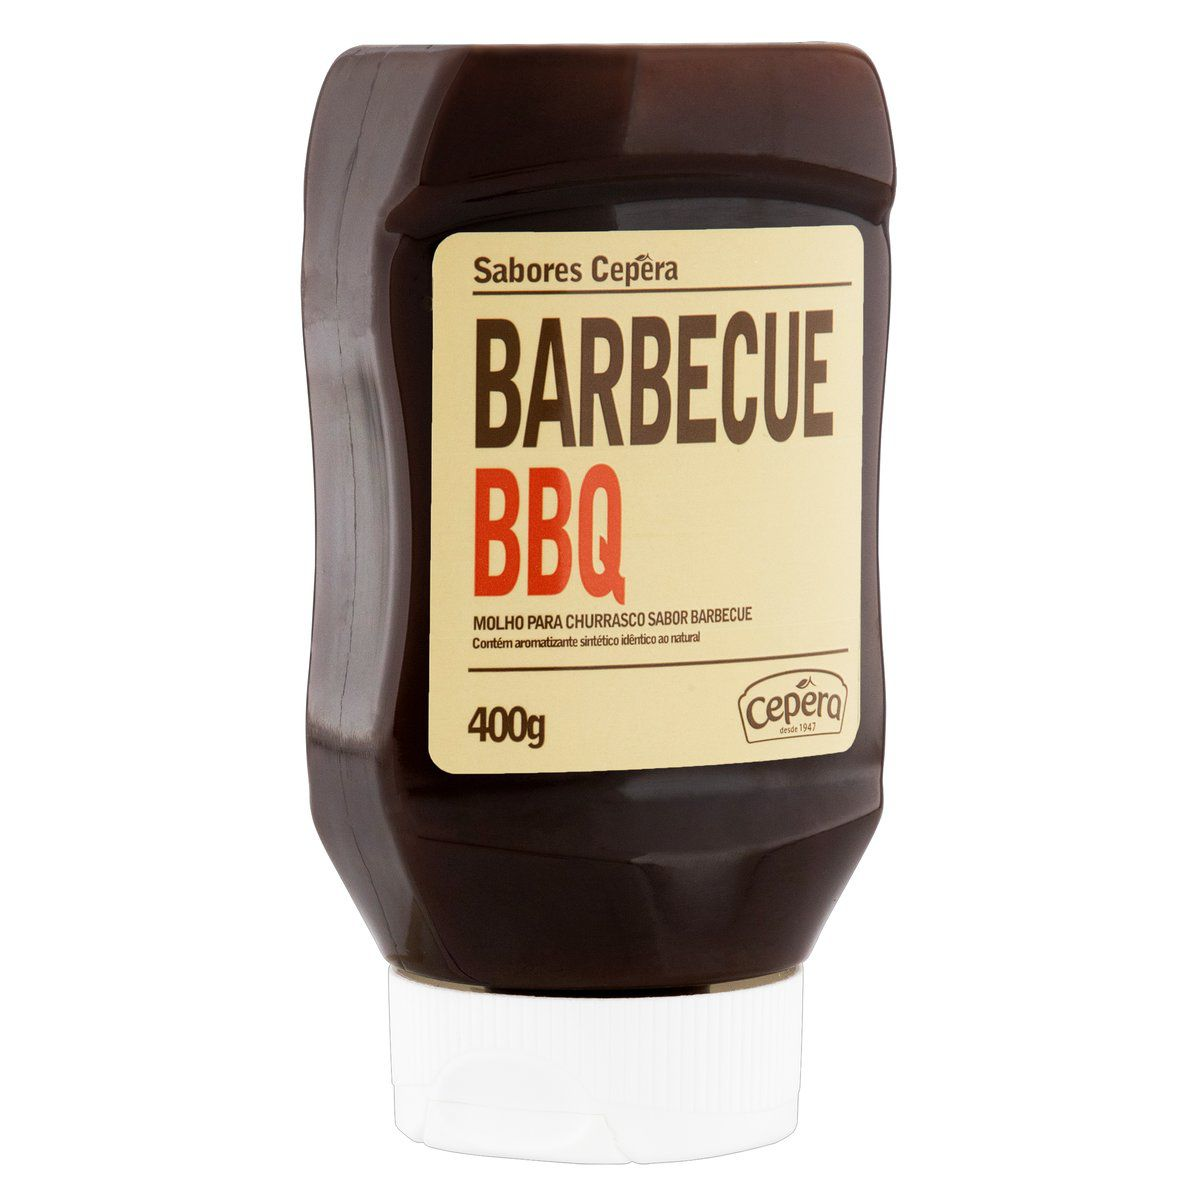 Barbecue BBQ 400g